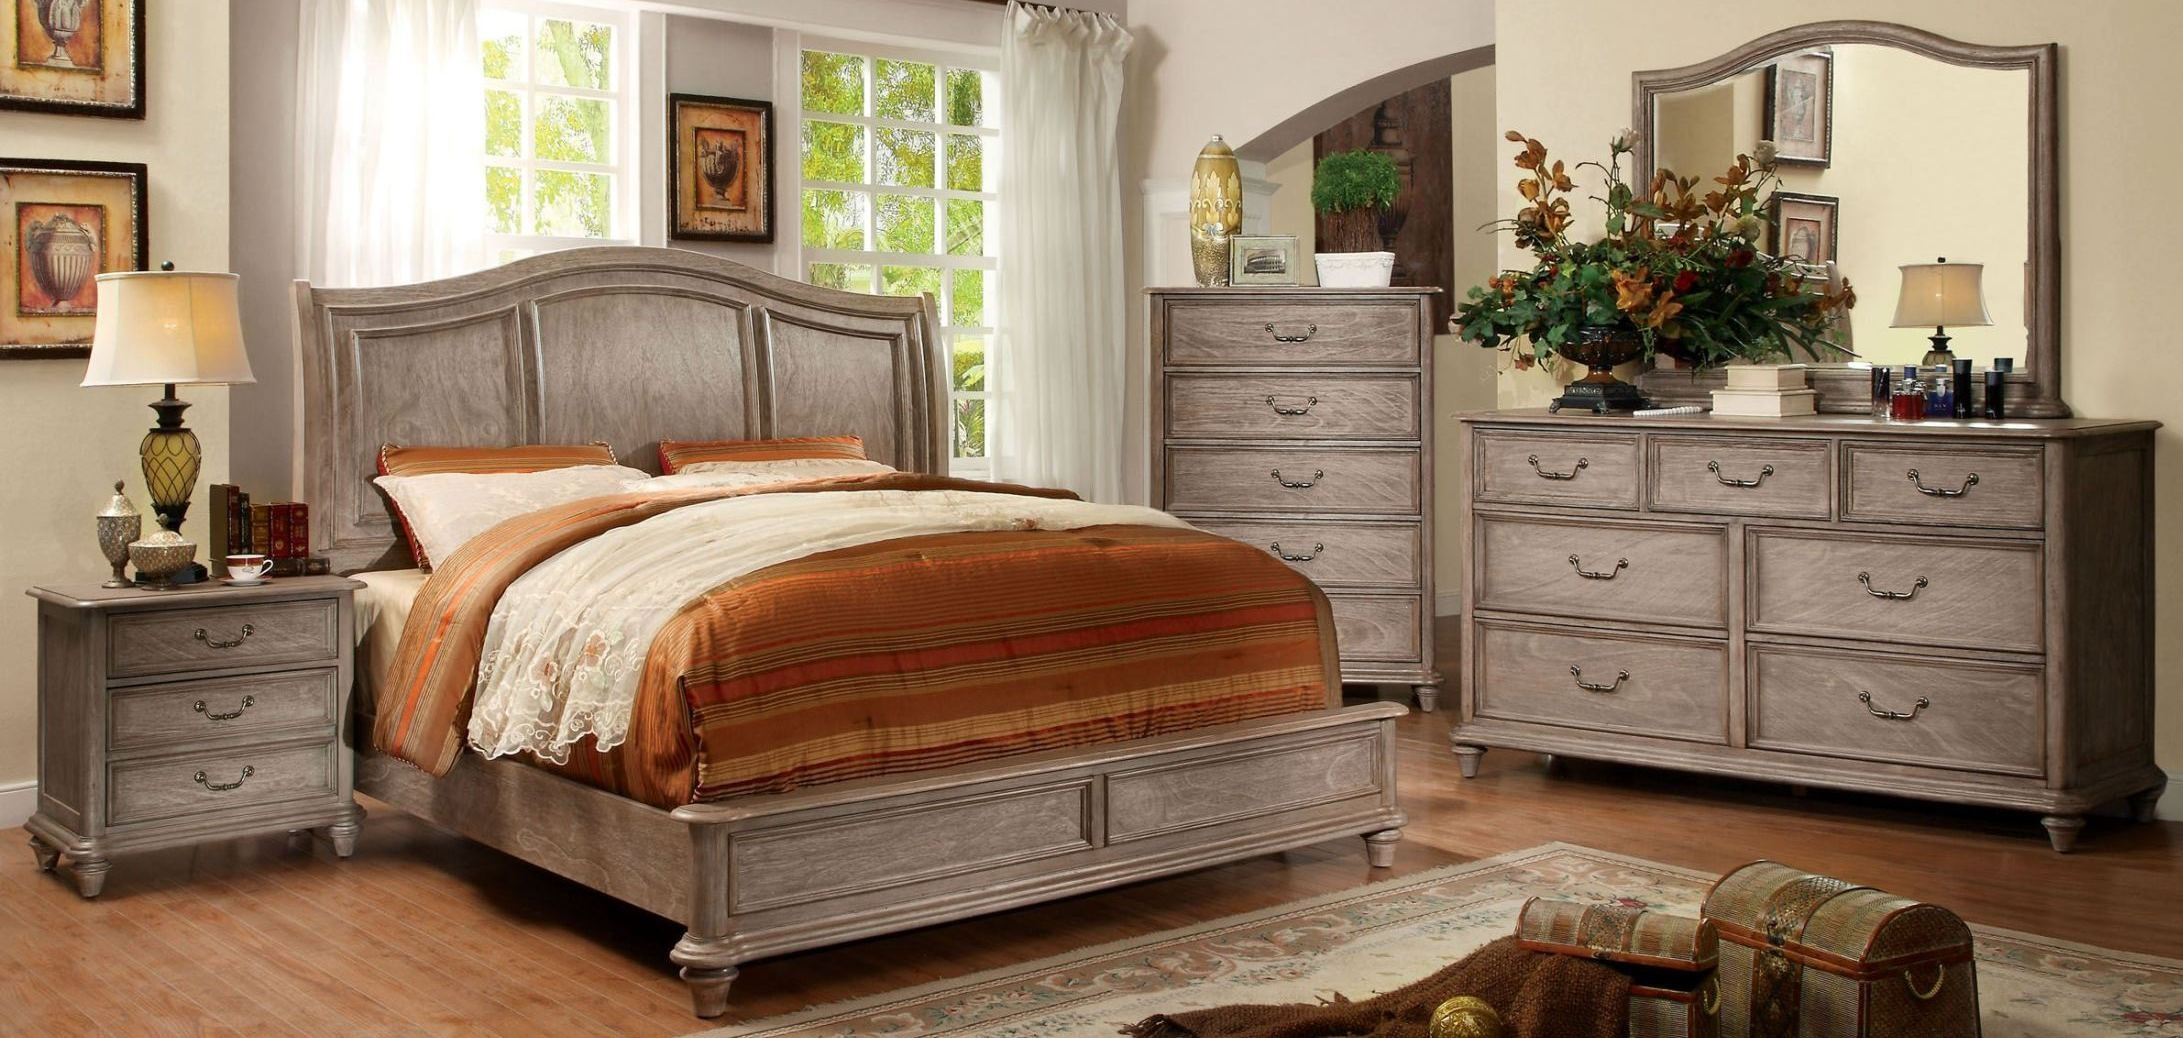 Belgrade ii rustic natural tone bedroom set from furniture